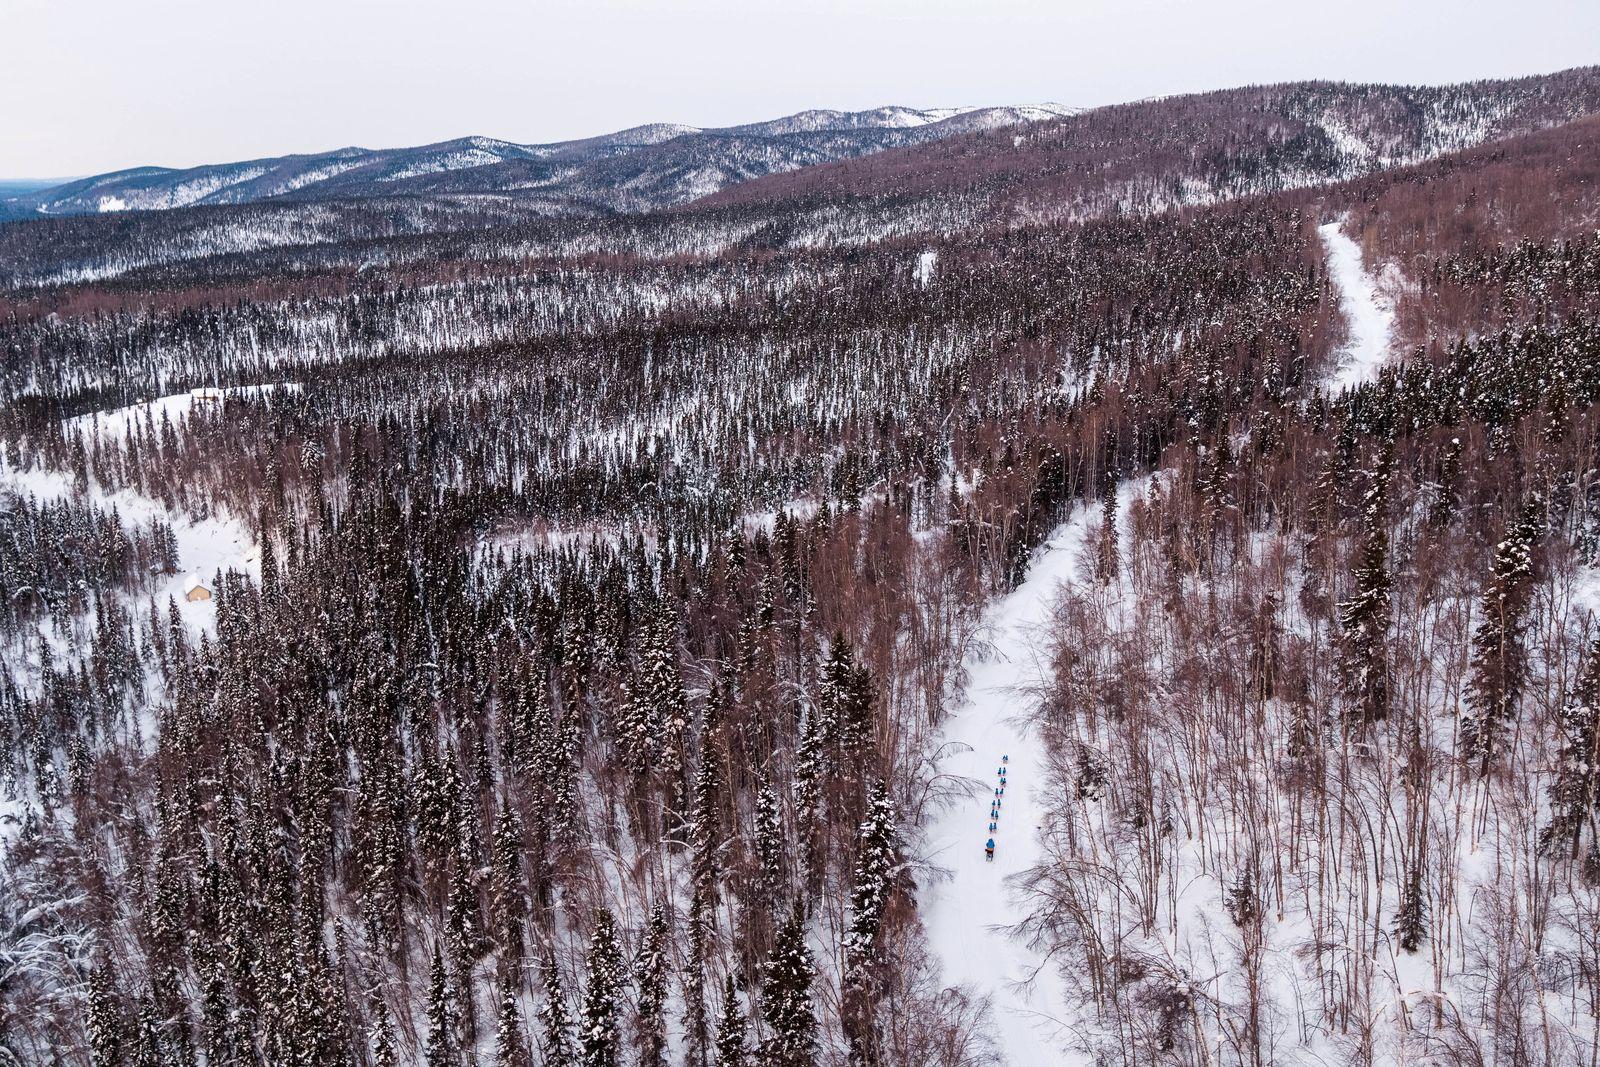 2020 Iditarod, Iditarod 2020, Takotna, Tom Frode Johansen, aerial, aerial photo, aerial photography, aerial photos, aerials, iditarod